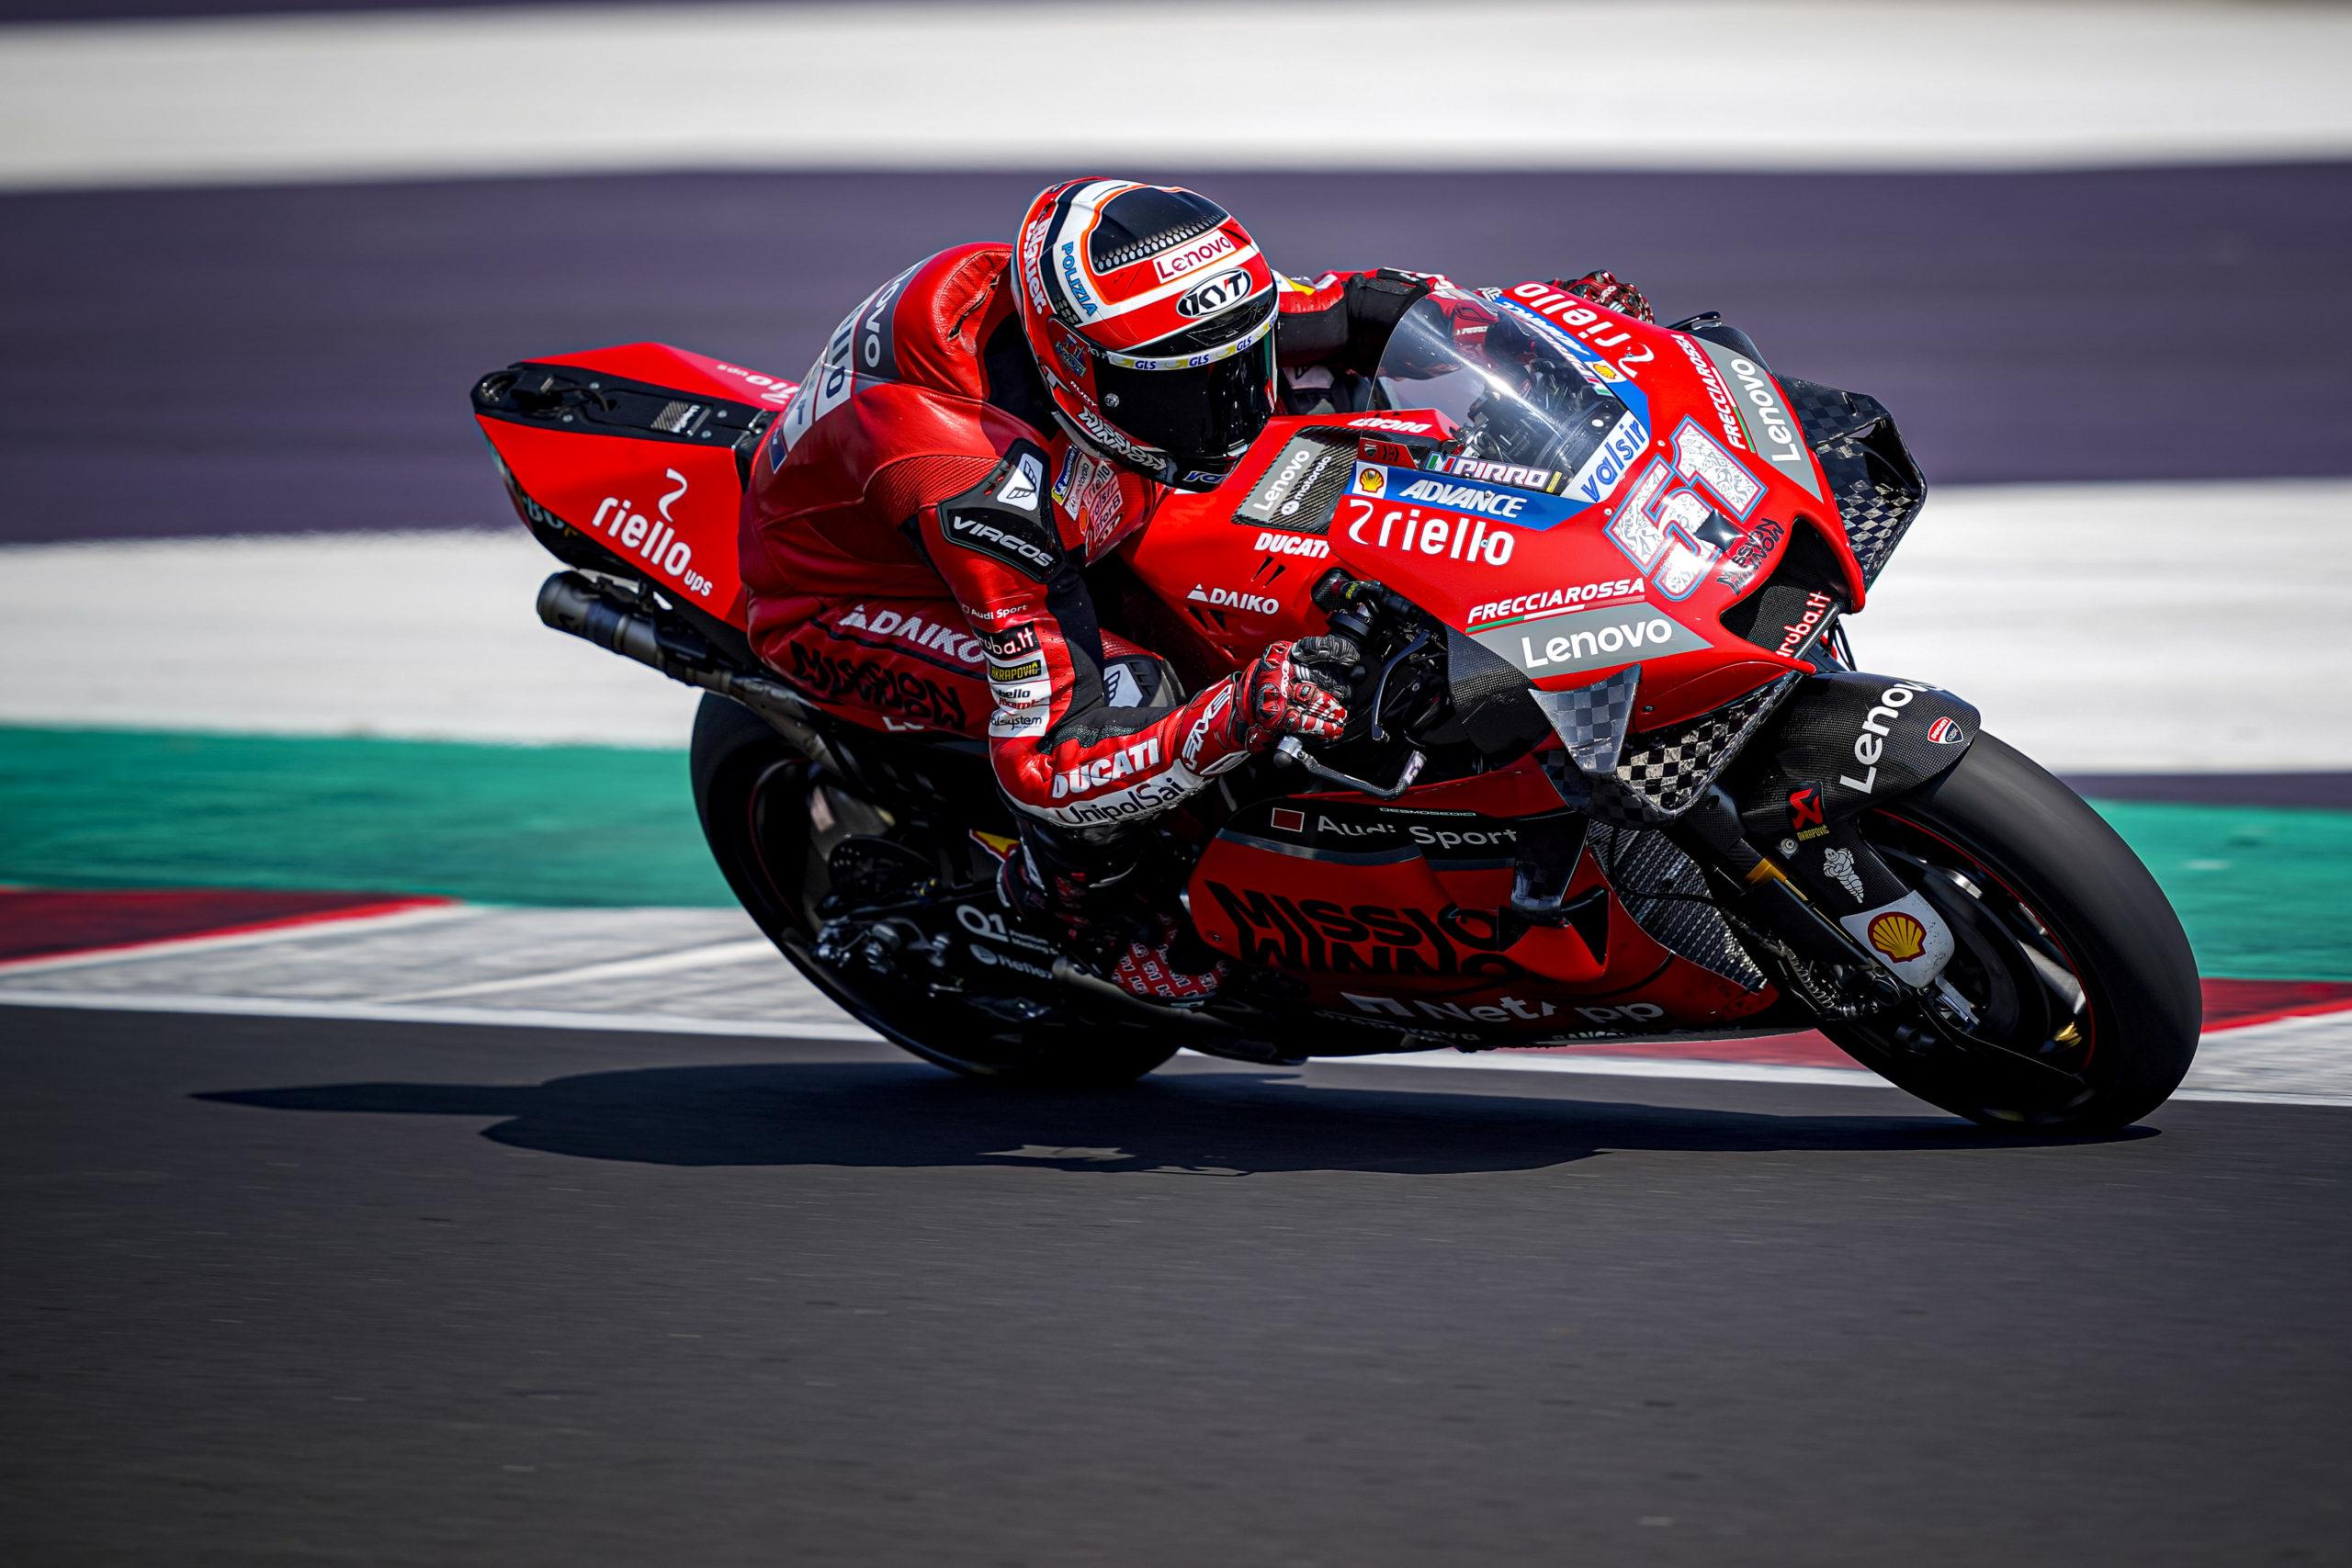 Michele Pirro, Misano test 2020, Ducati